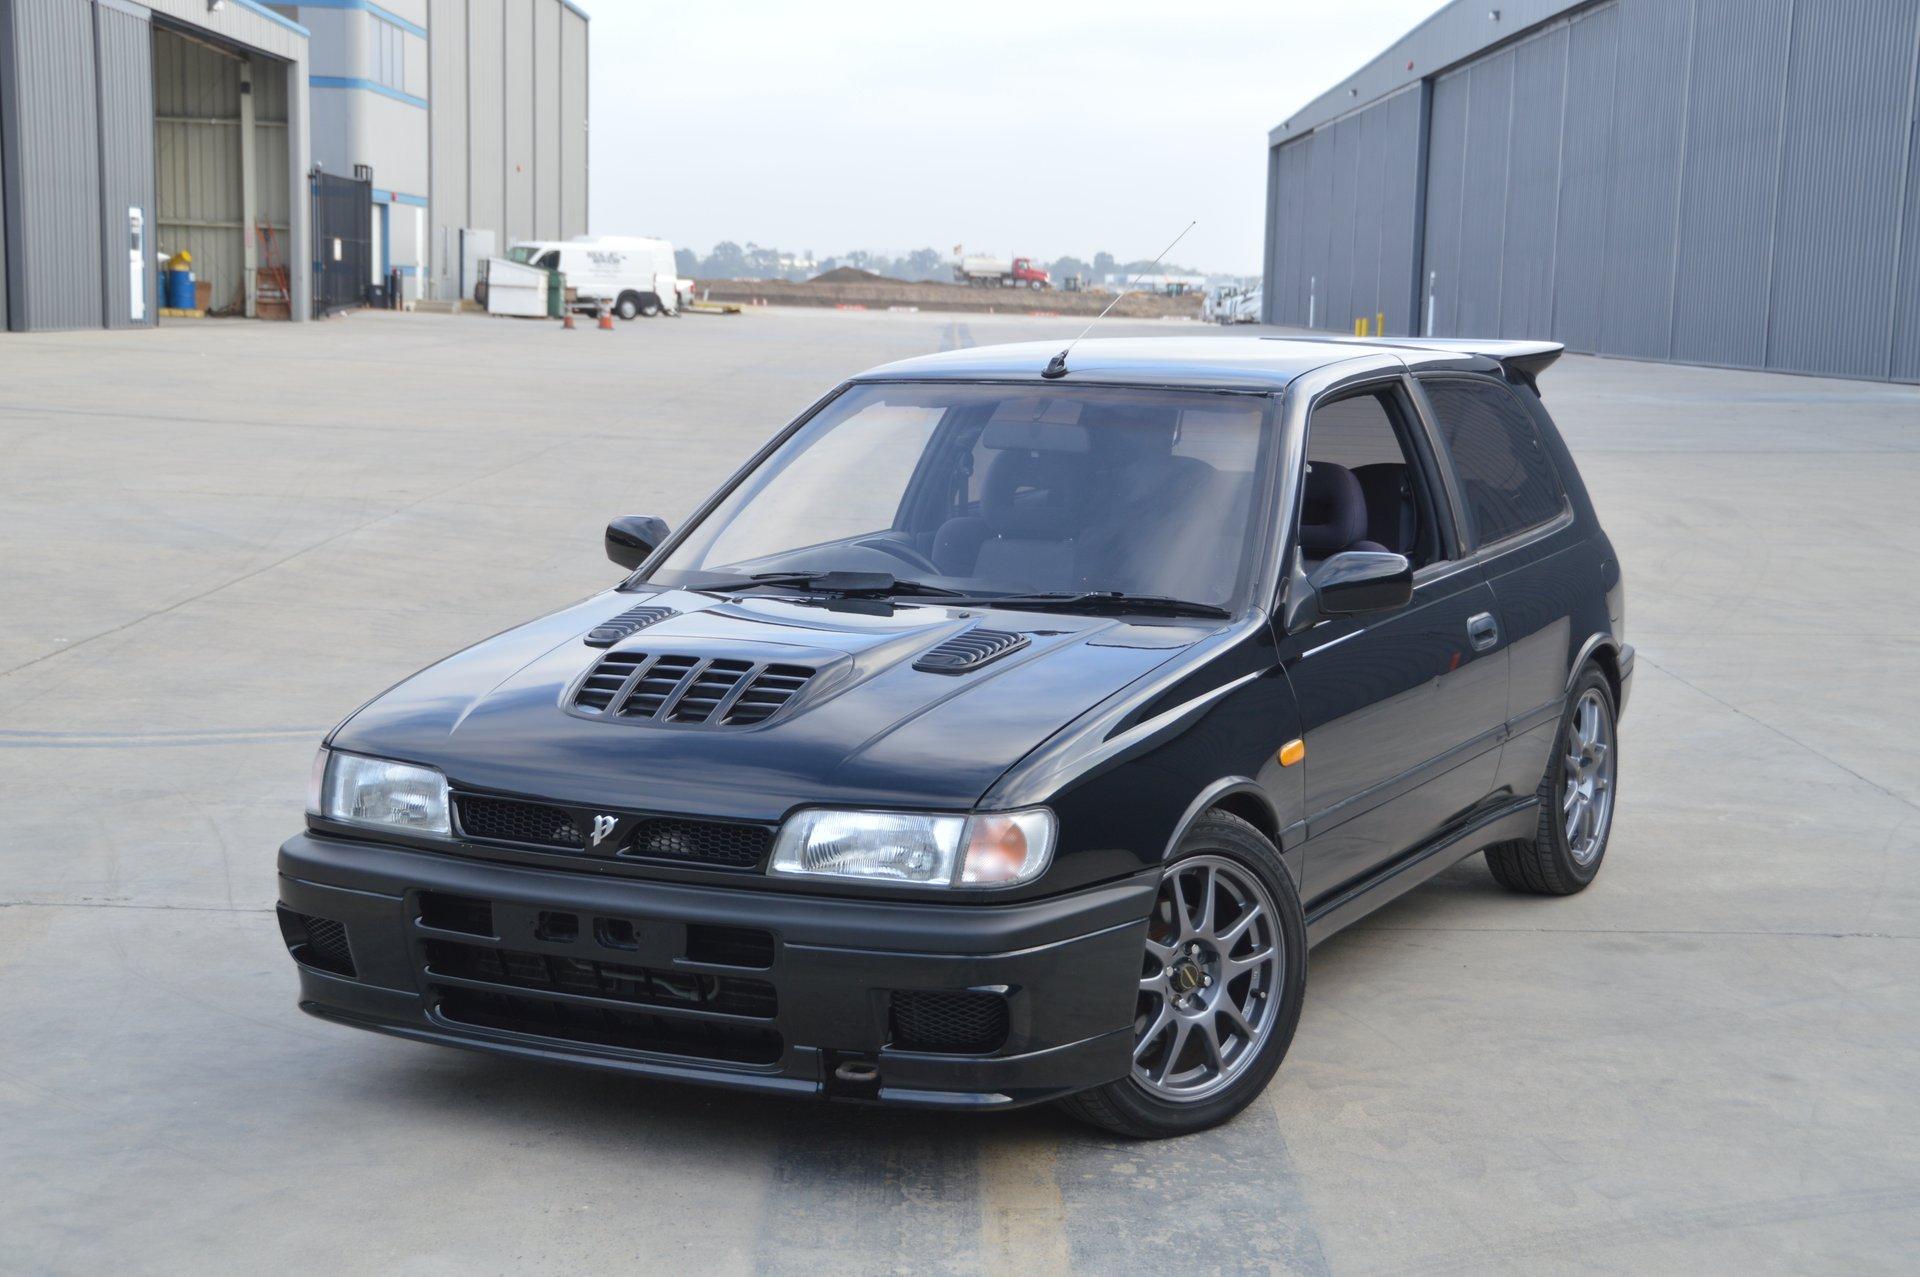 1992 Nissan Pulsar